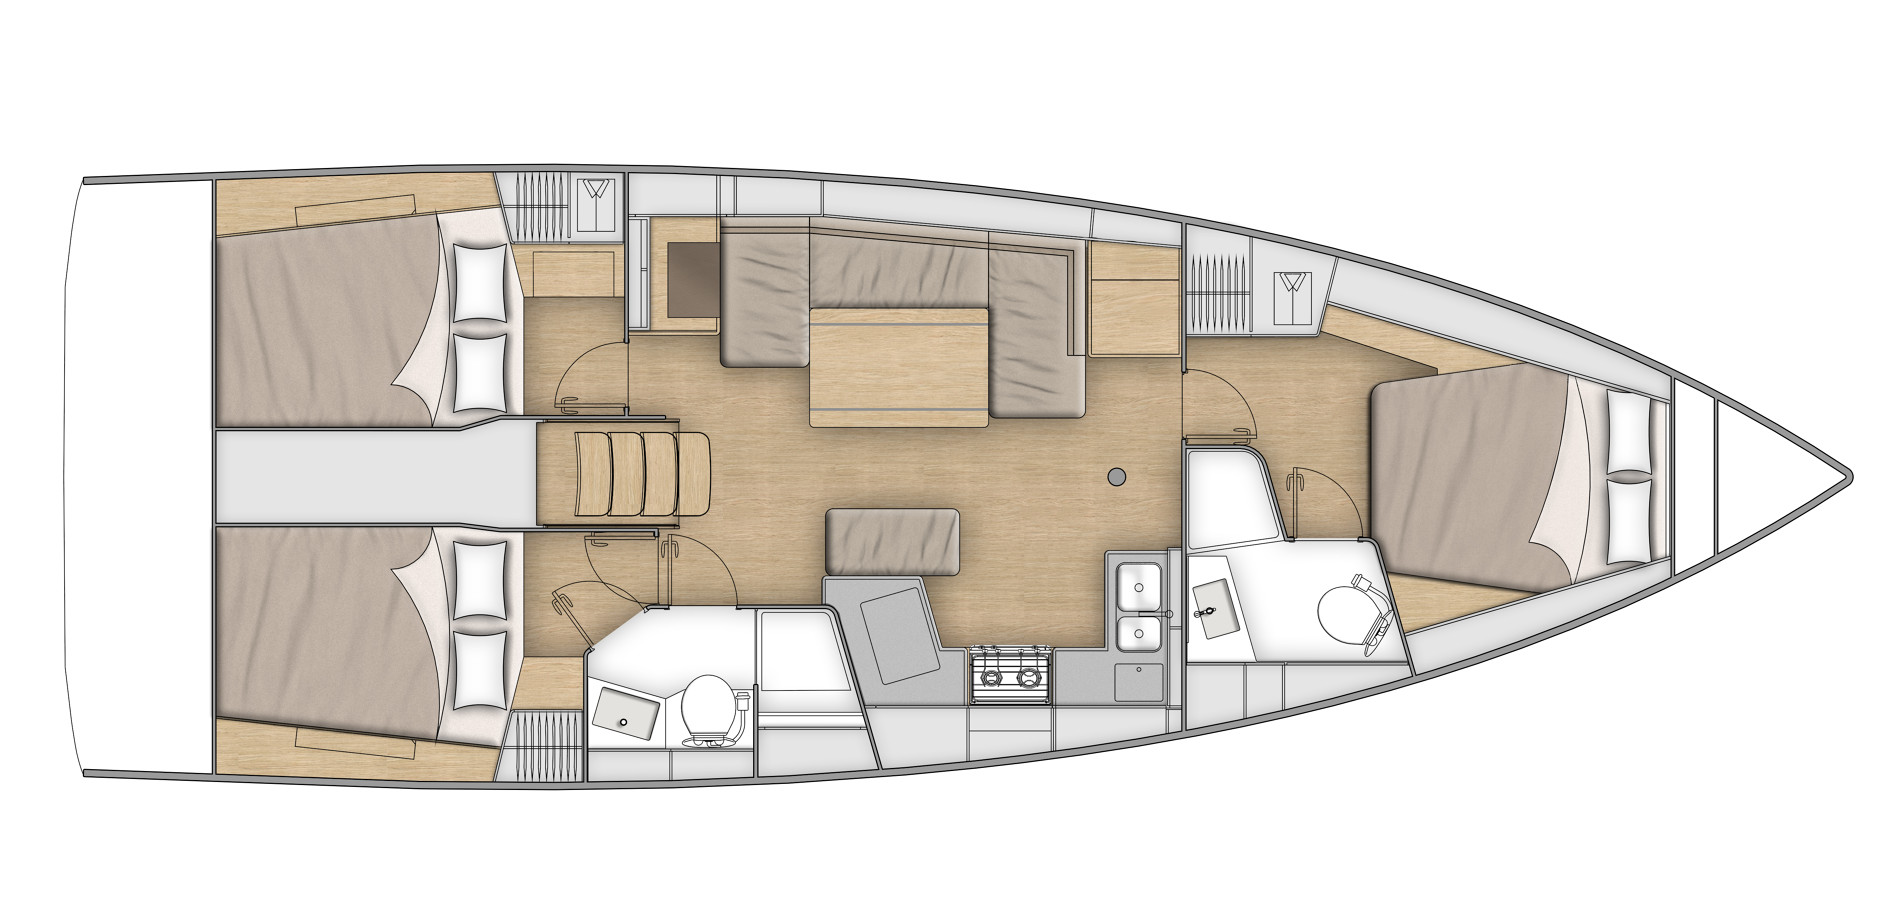 OC40-layout-3c-2t.jpg-1900px